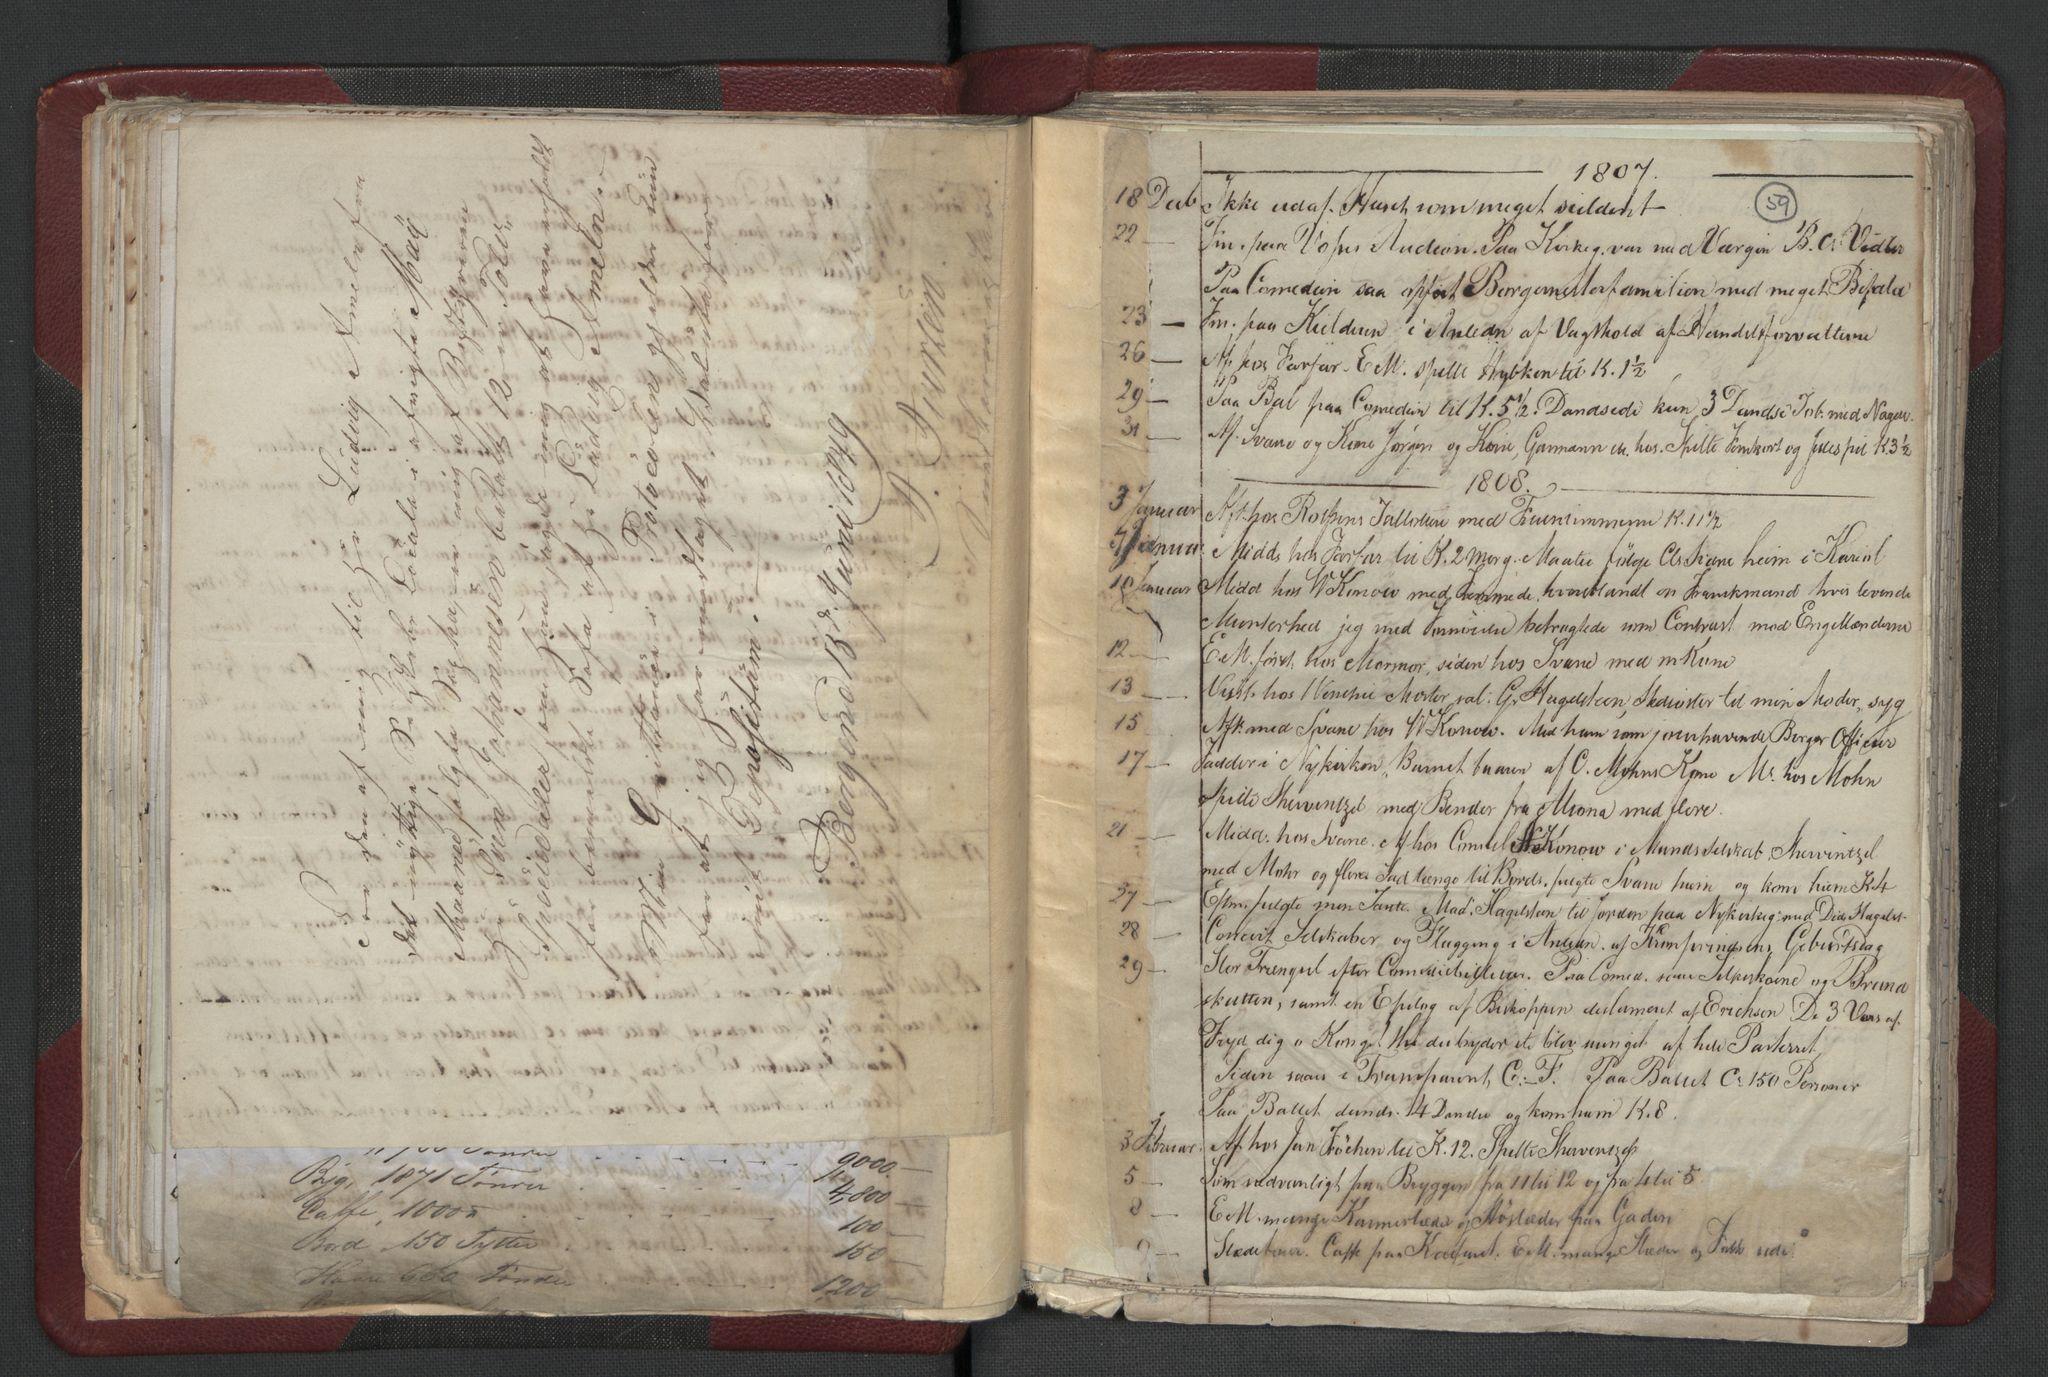 RA, Meltzer, Fredrik, F/L0001: Dagbok for årene 1796-1808, 1811, 1817, 1796-1817, s. 58b-59a